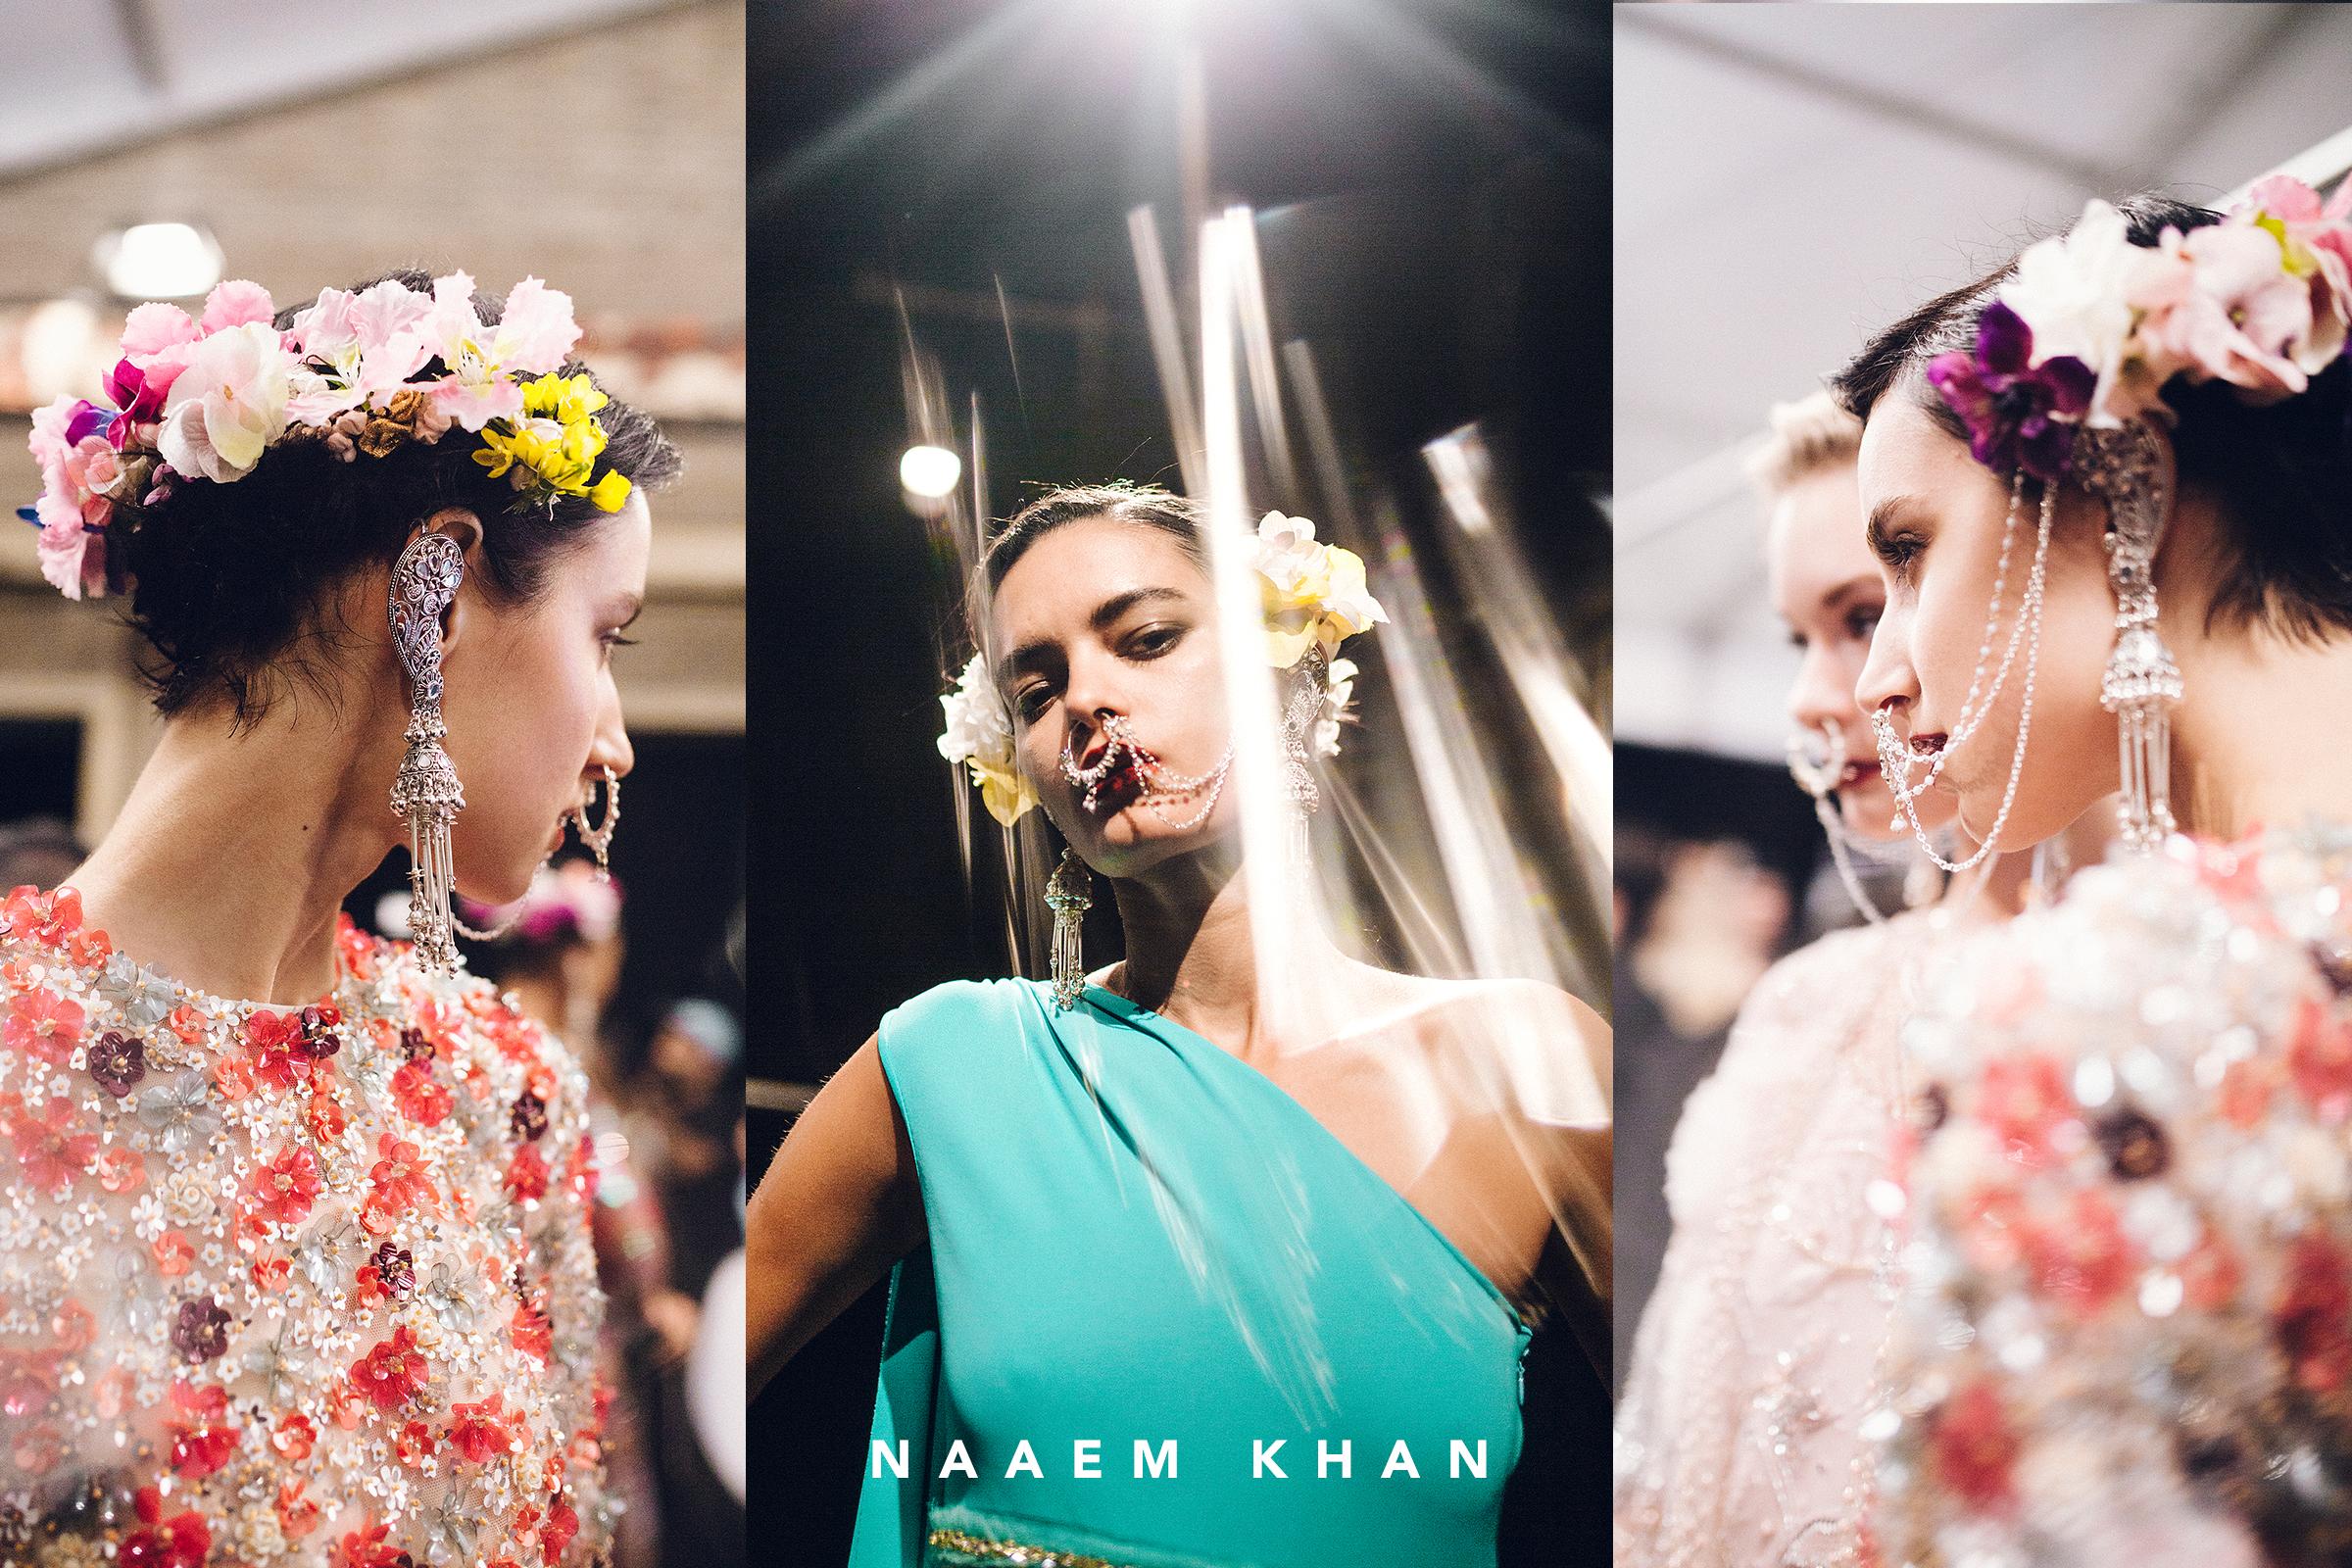 Naaem-Khan.jpg